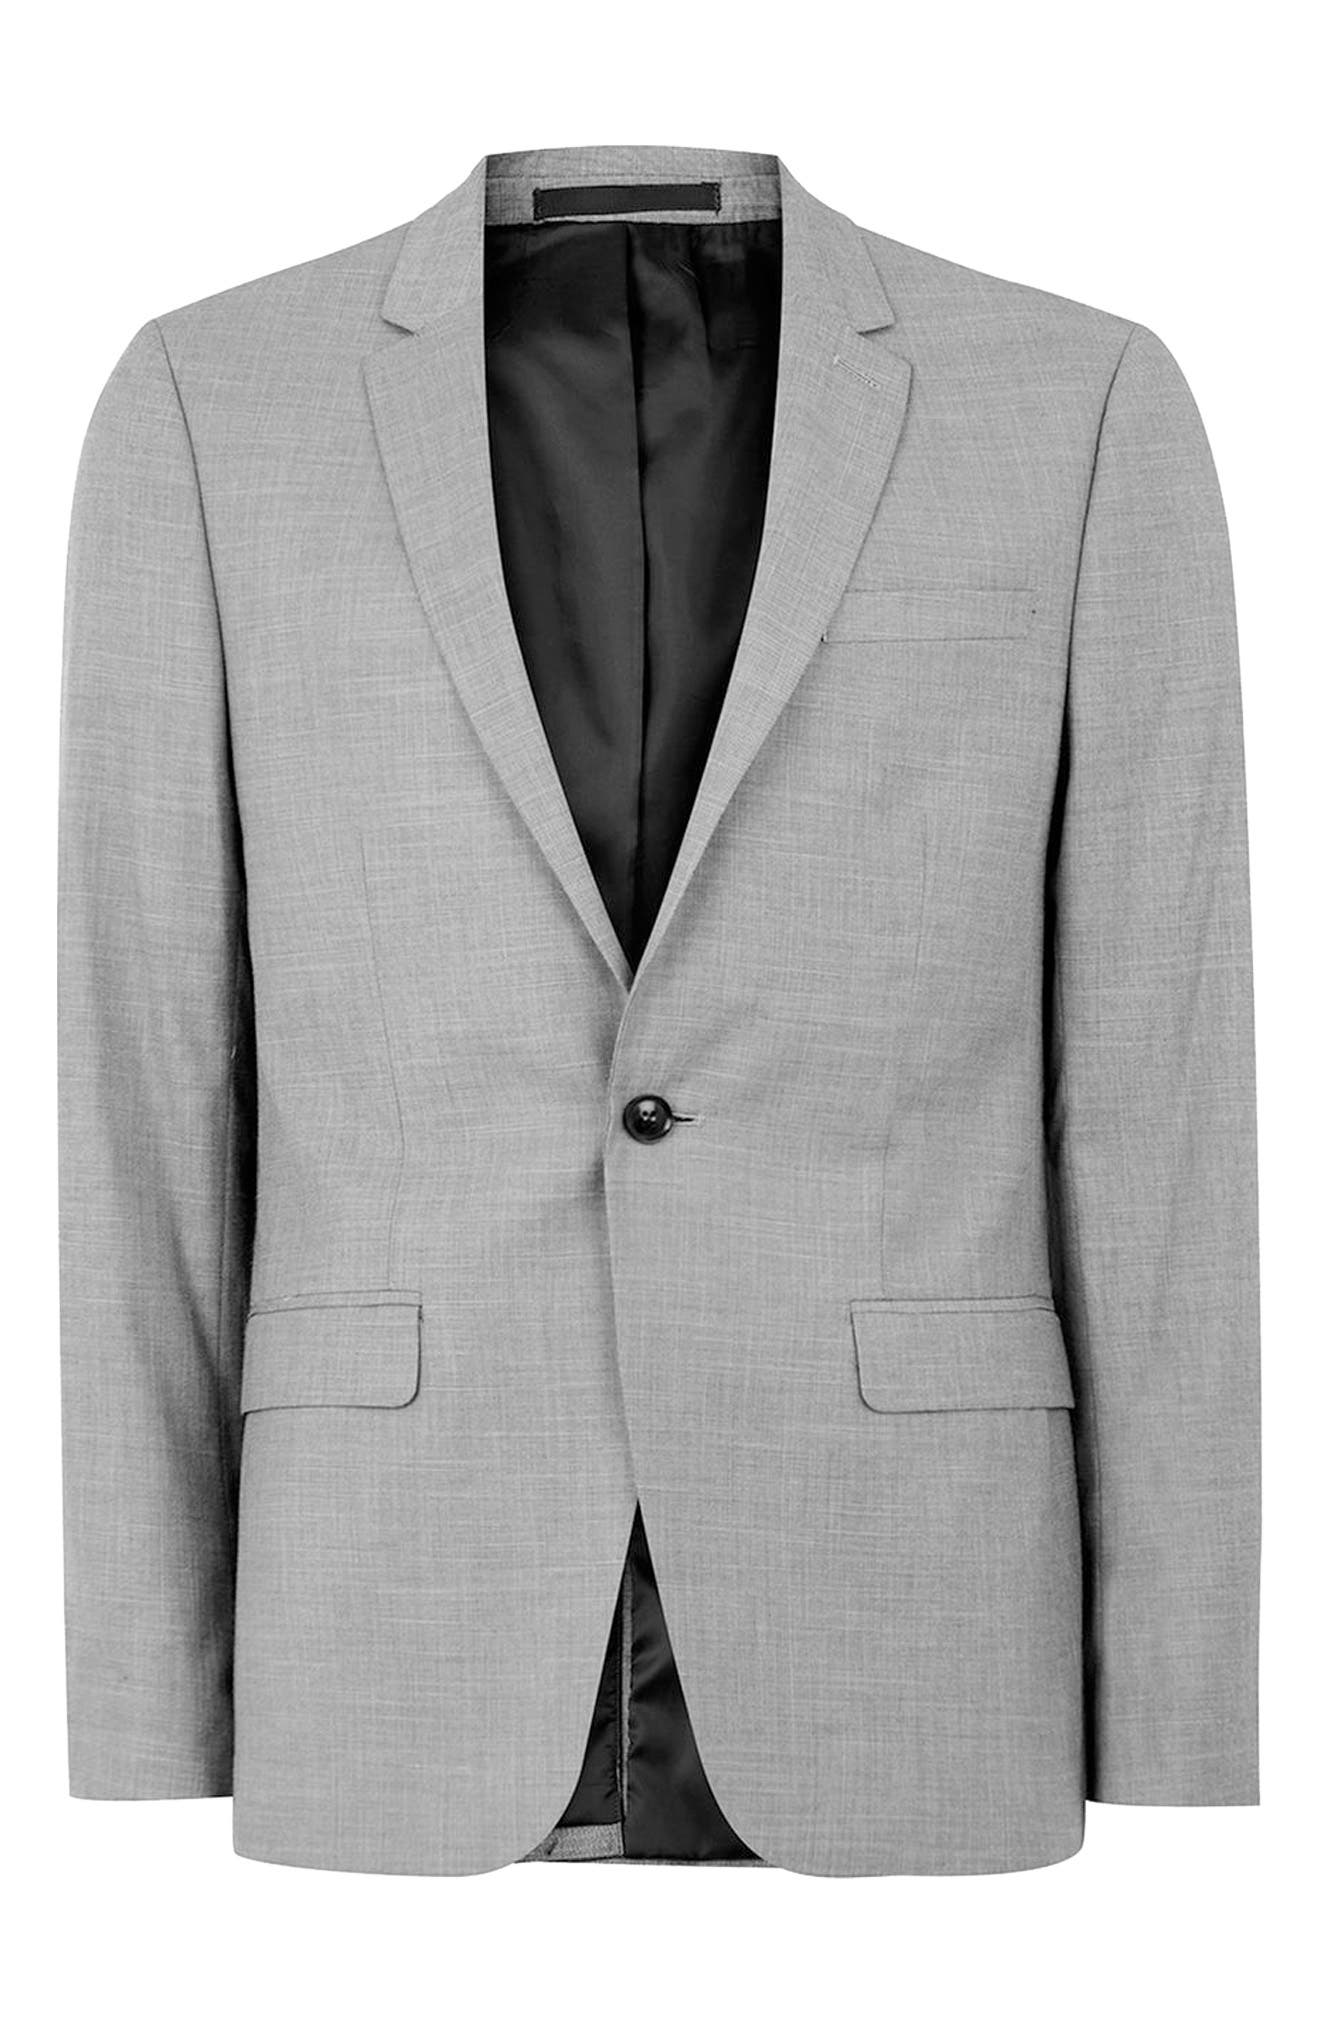 TOPMAN, Skinny Fit Suit Jacket, Alternate thumbnail 5, color, GREY